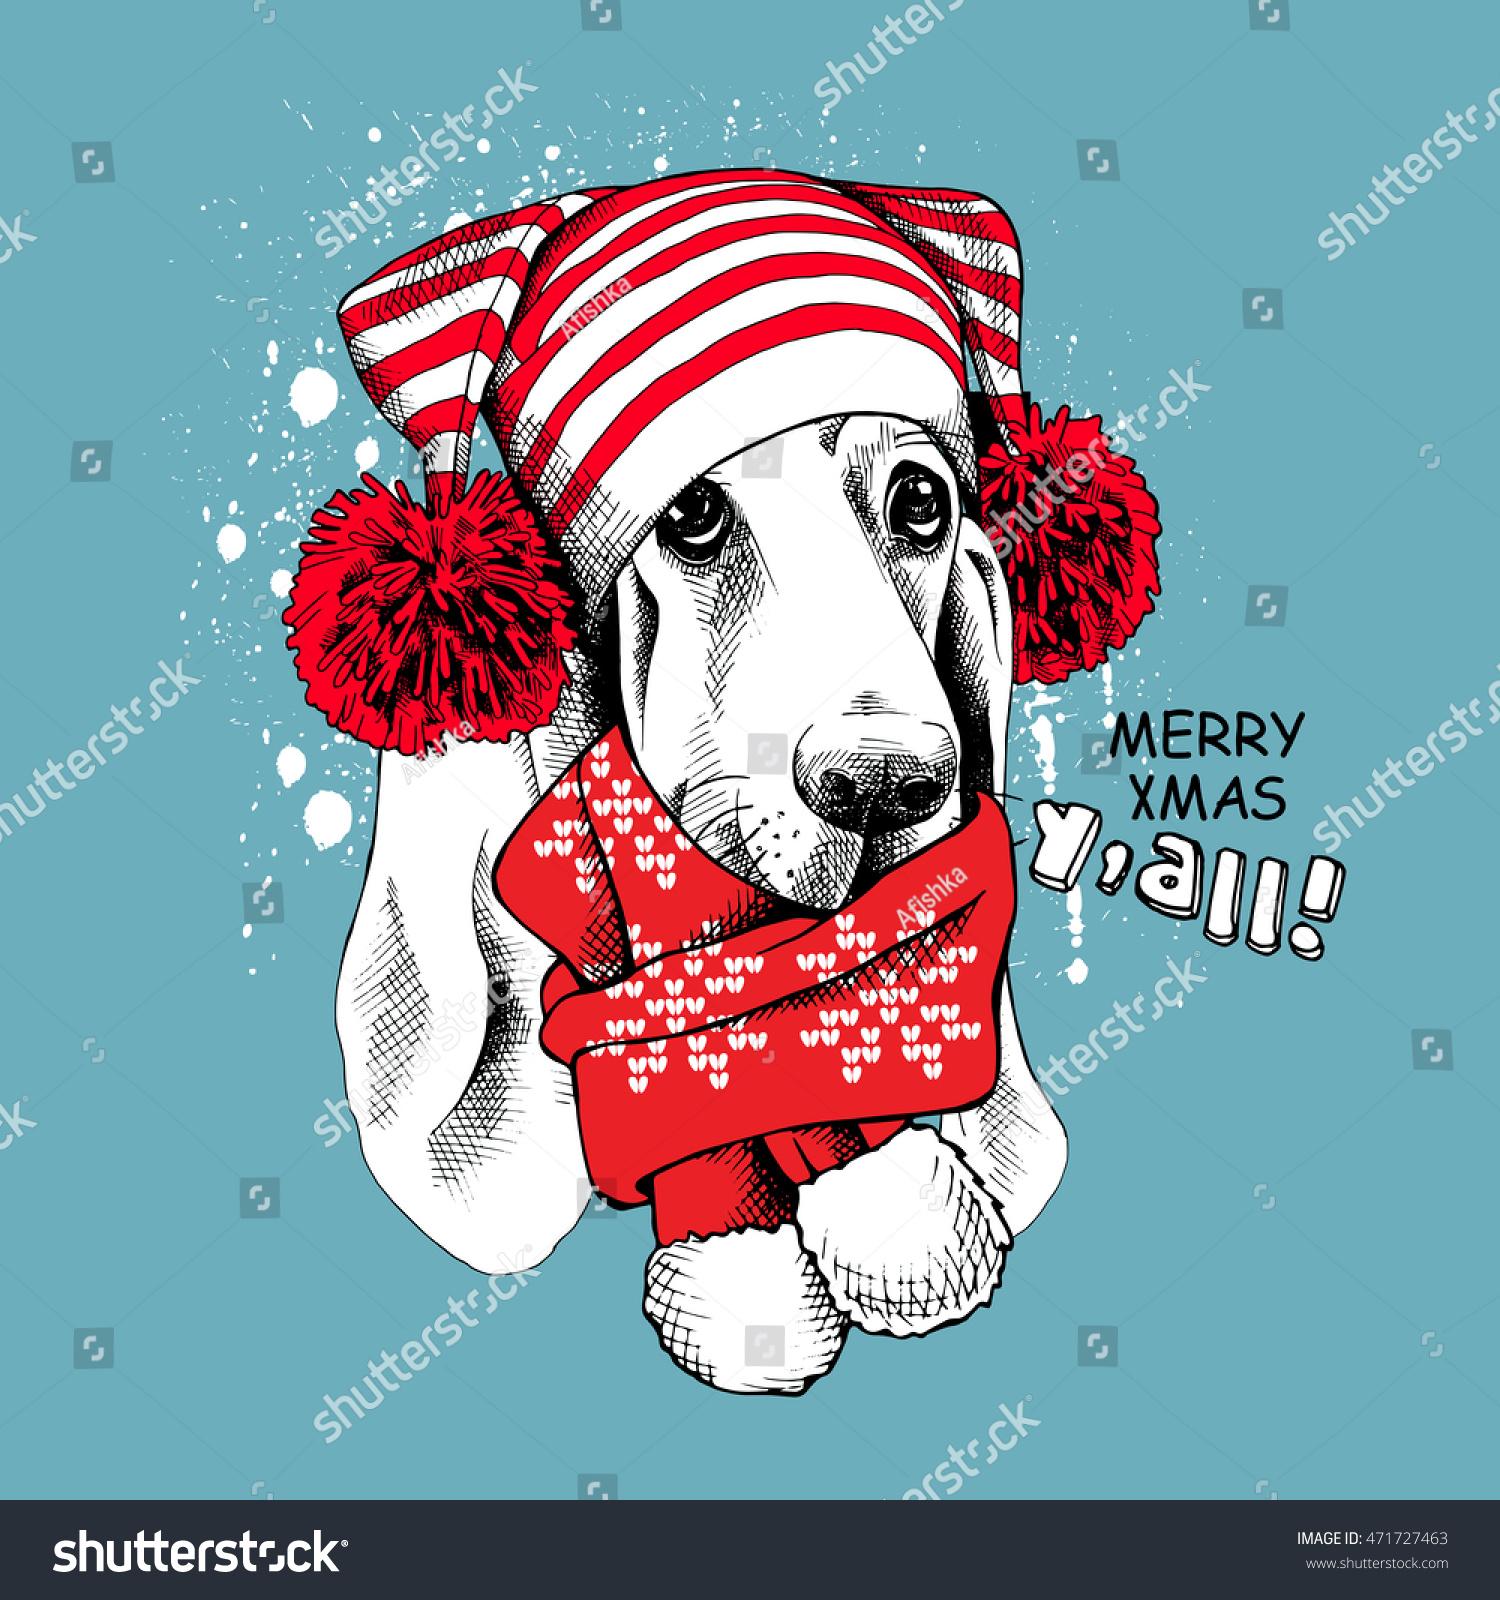 Christmas Card Portrait Basset Hound Dog Stock Vector (Royalty Free ...